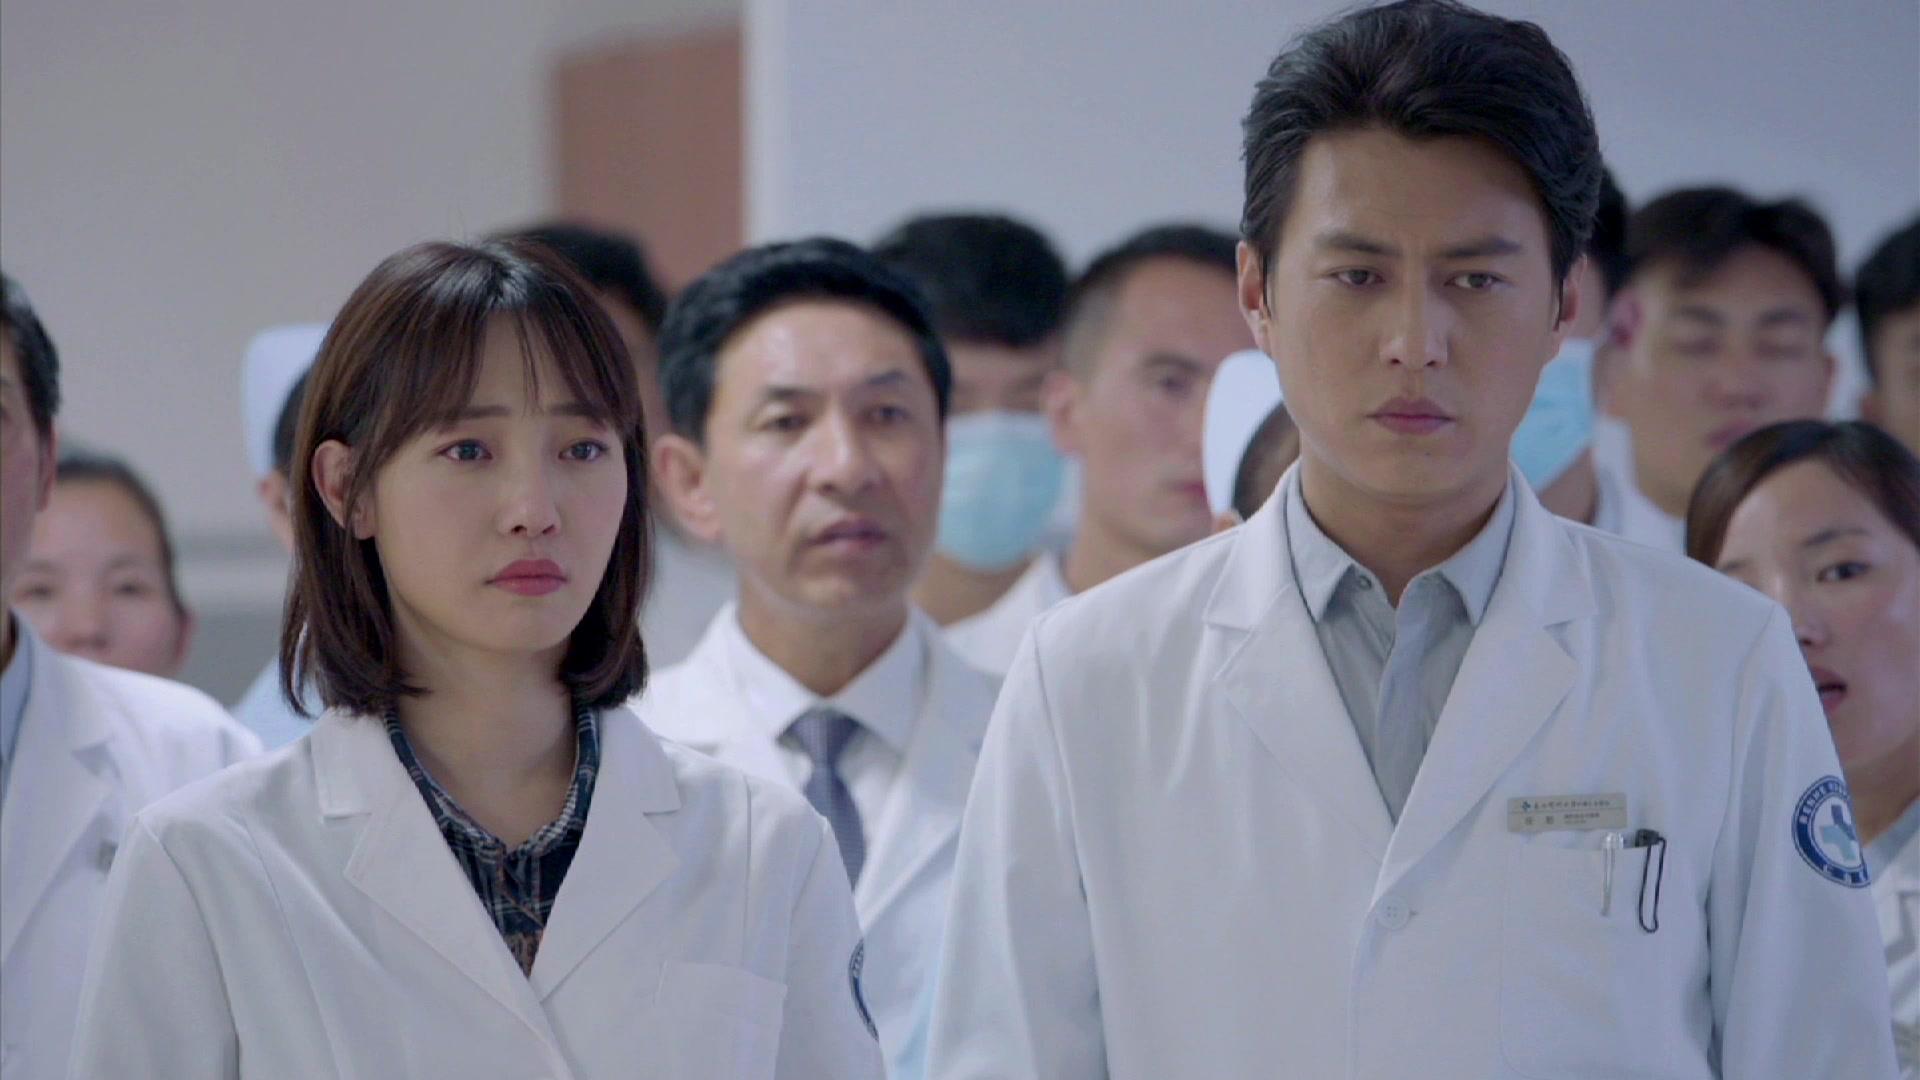 Trailer: Surgeons